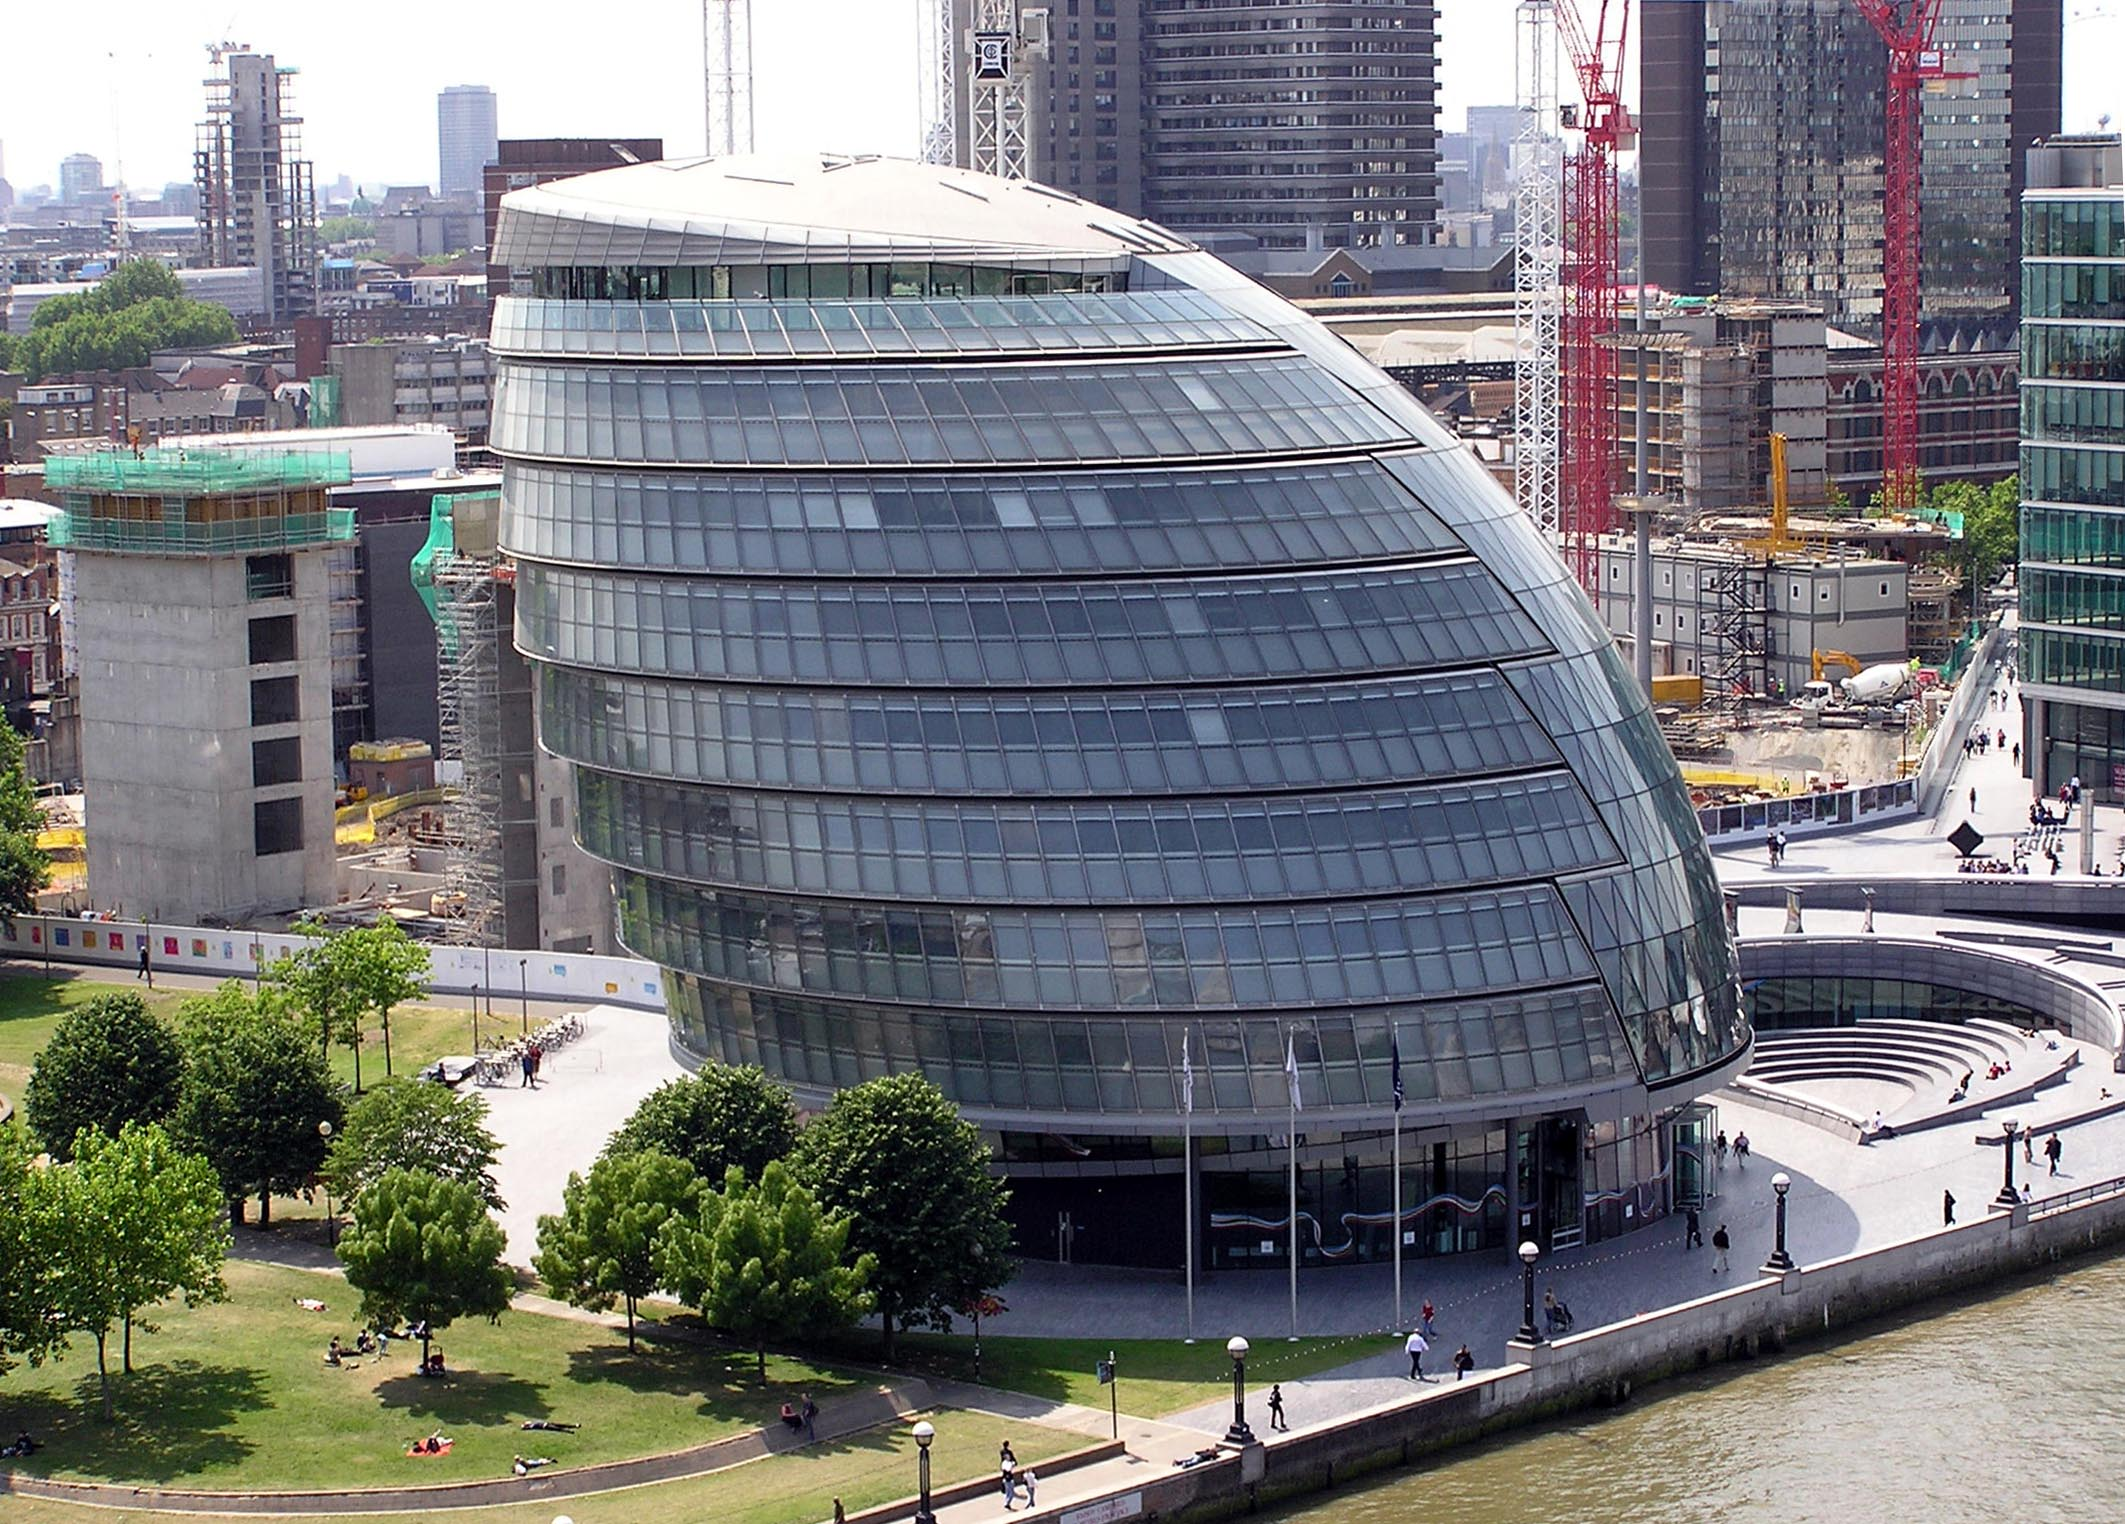 City Hall in London UK